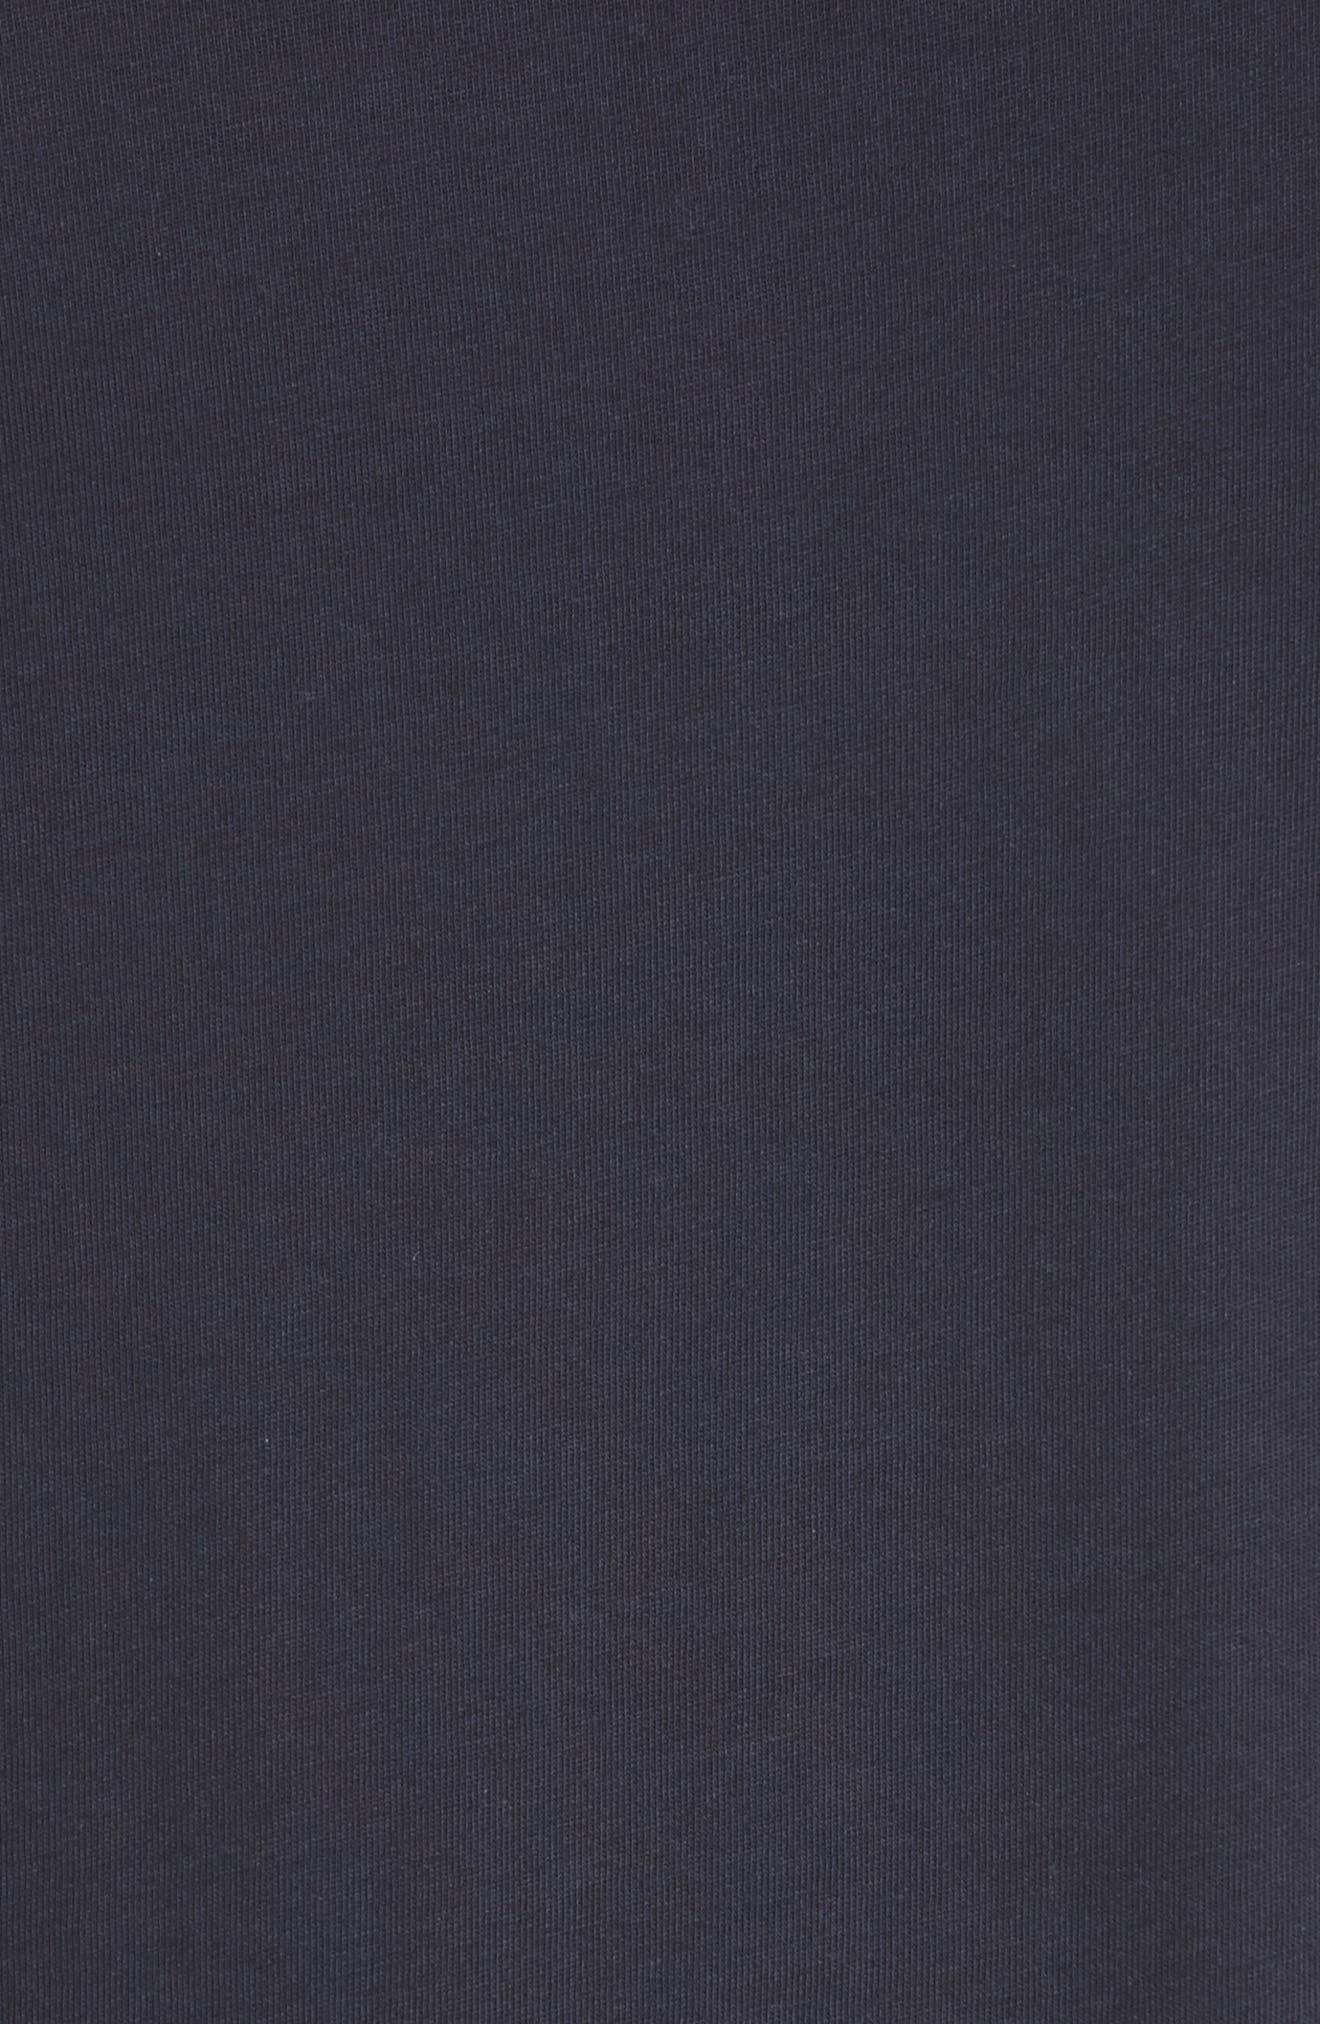 Uima Ruffle Cotton Top,                             Alternate thumbnail 5, color,                             True Navy